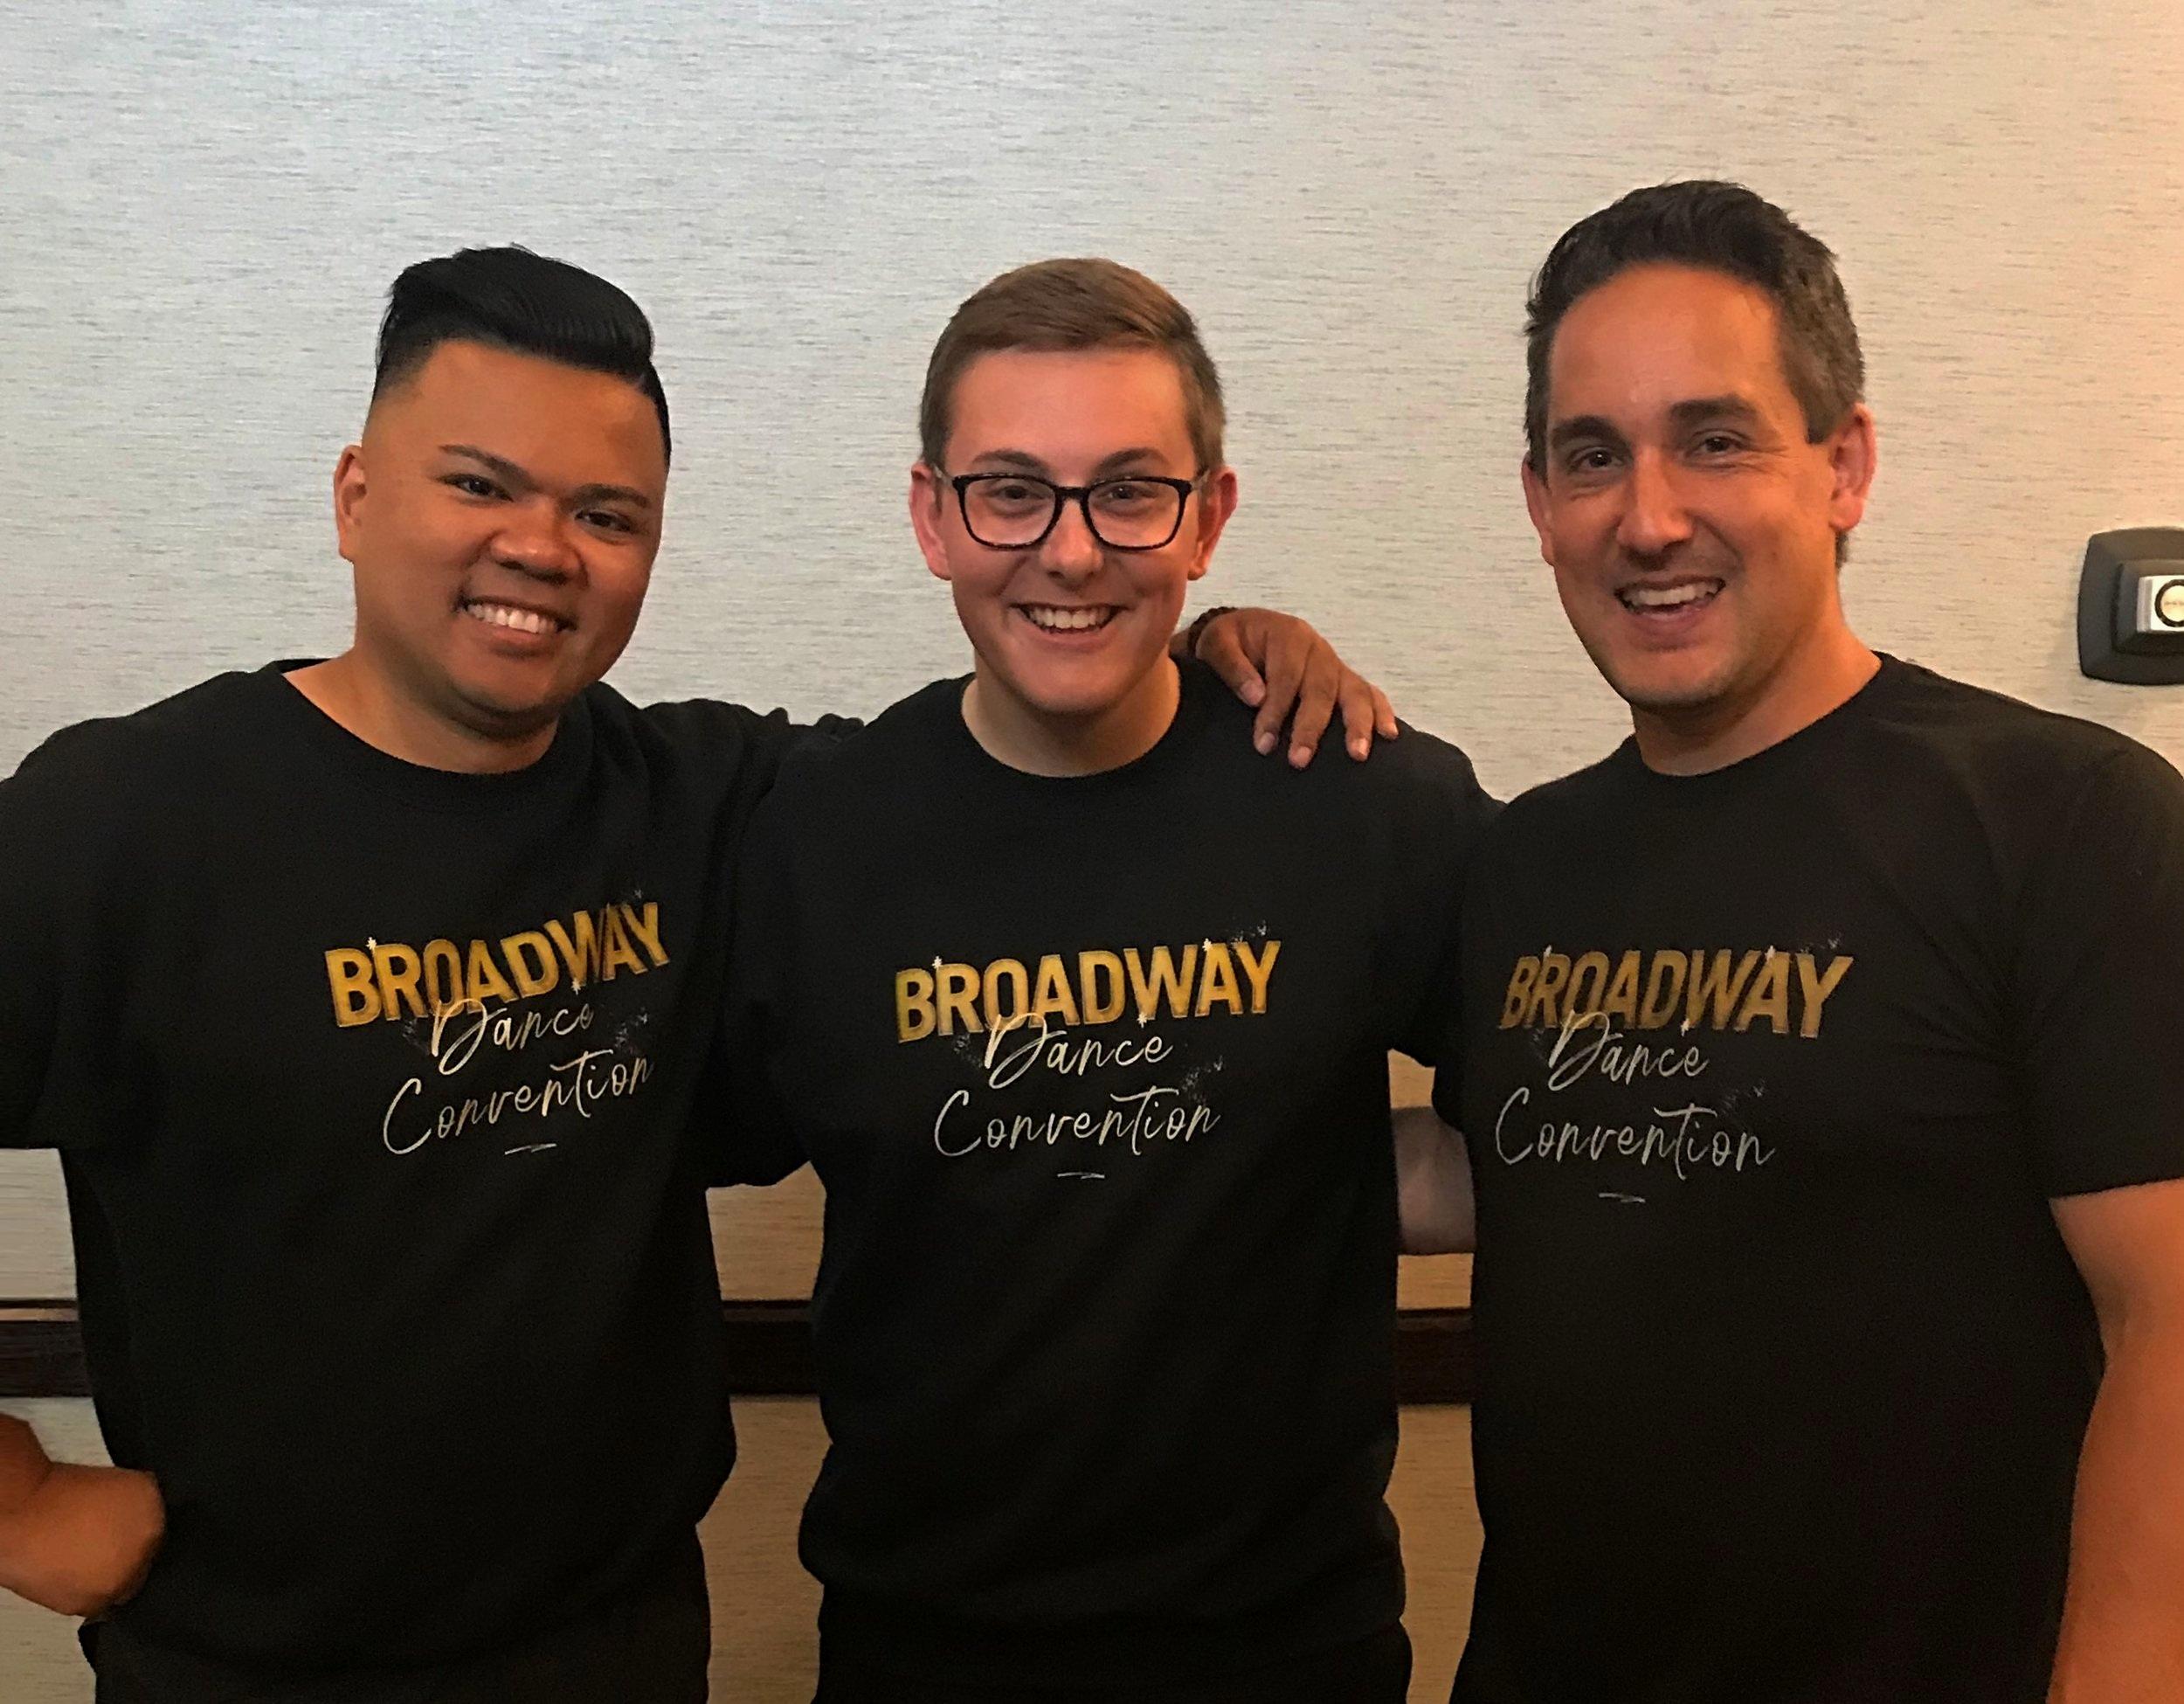 Joseph Sevillo, Tyler Leighton & Tad Kojima - Broadway Dance Convention Co-Directors